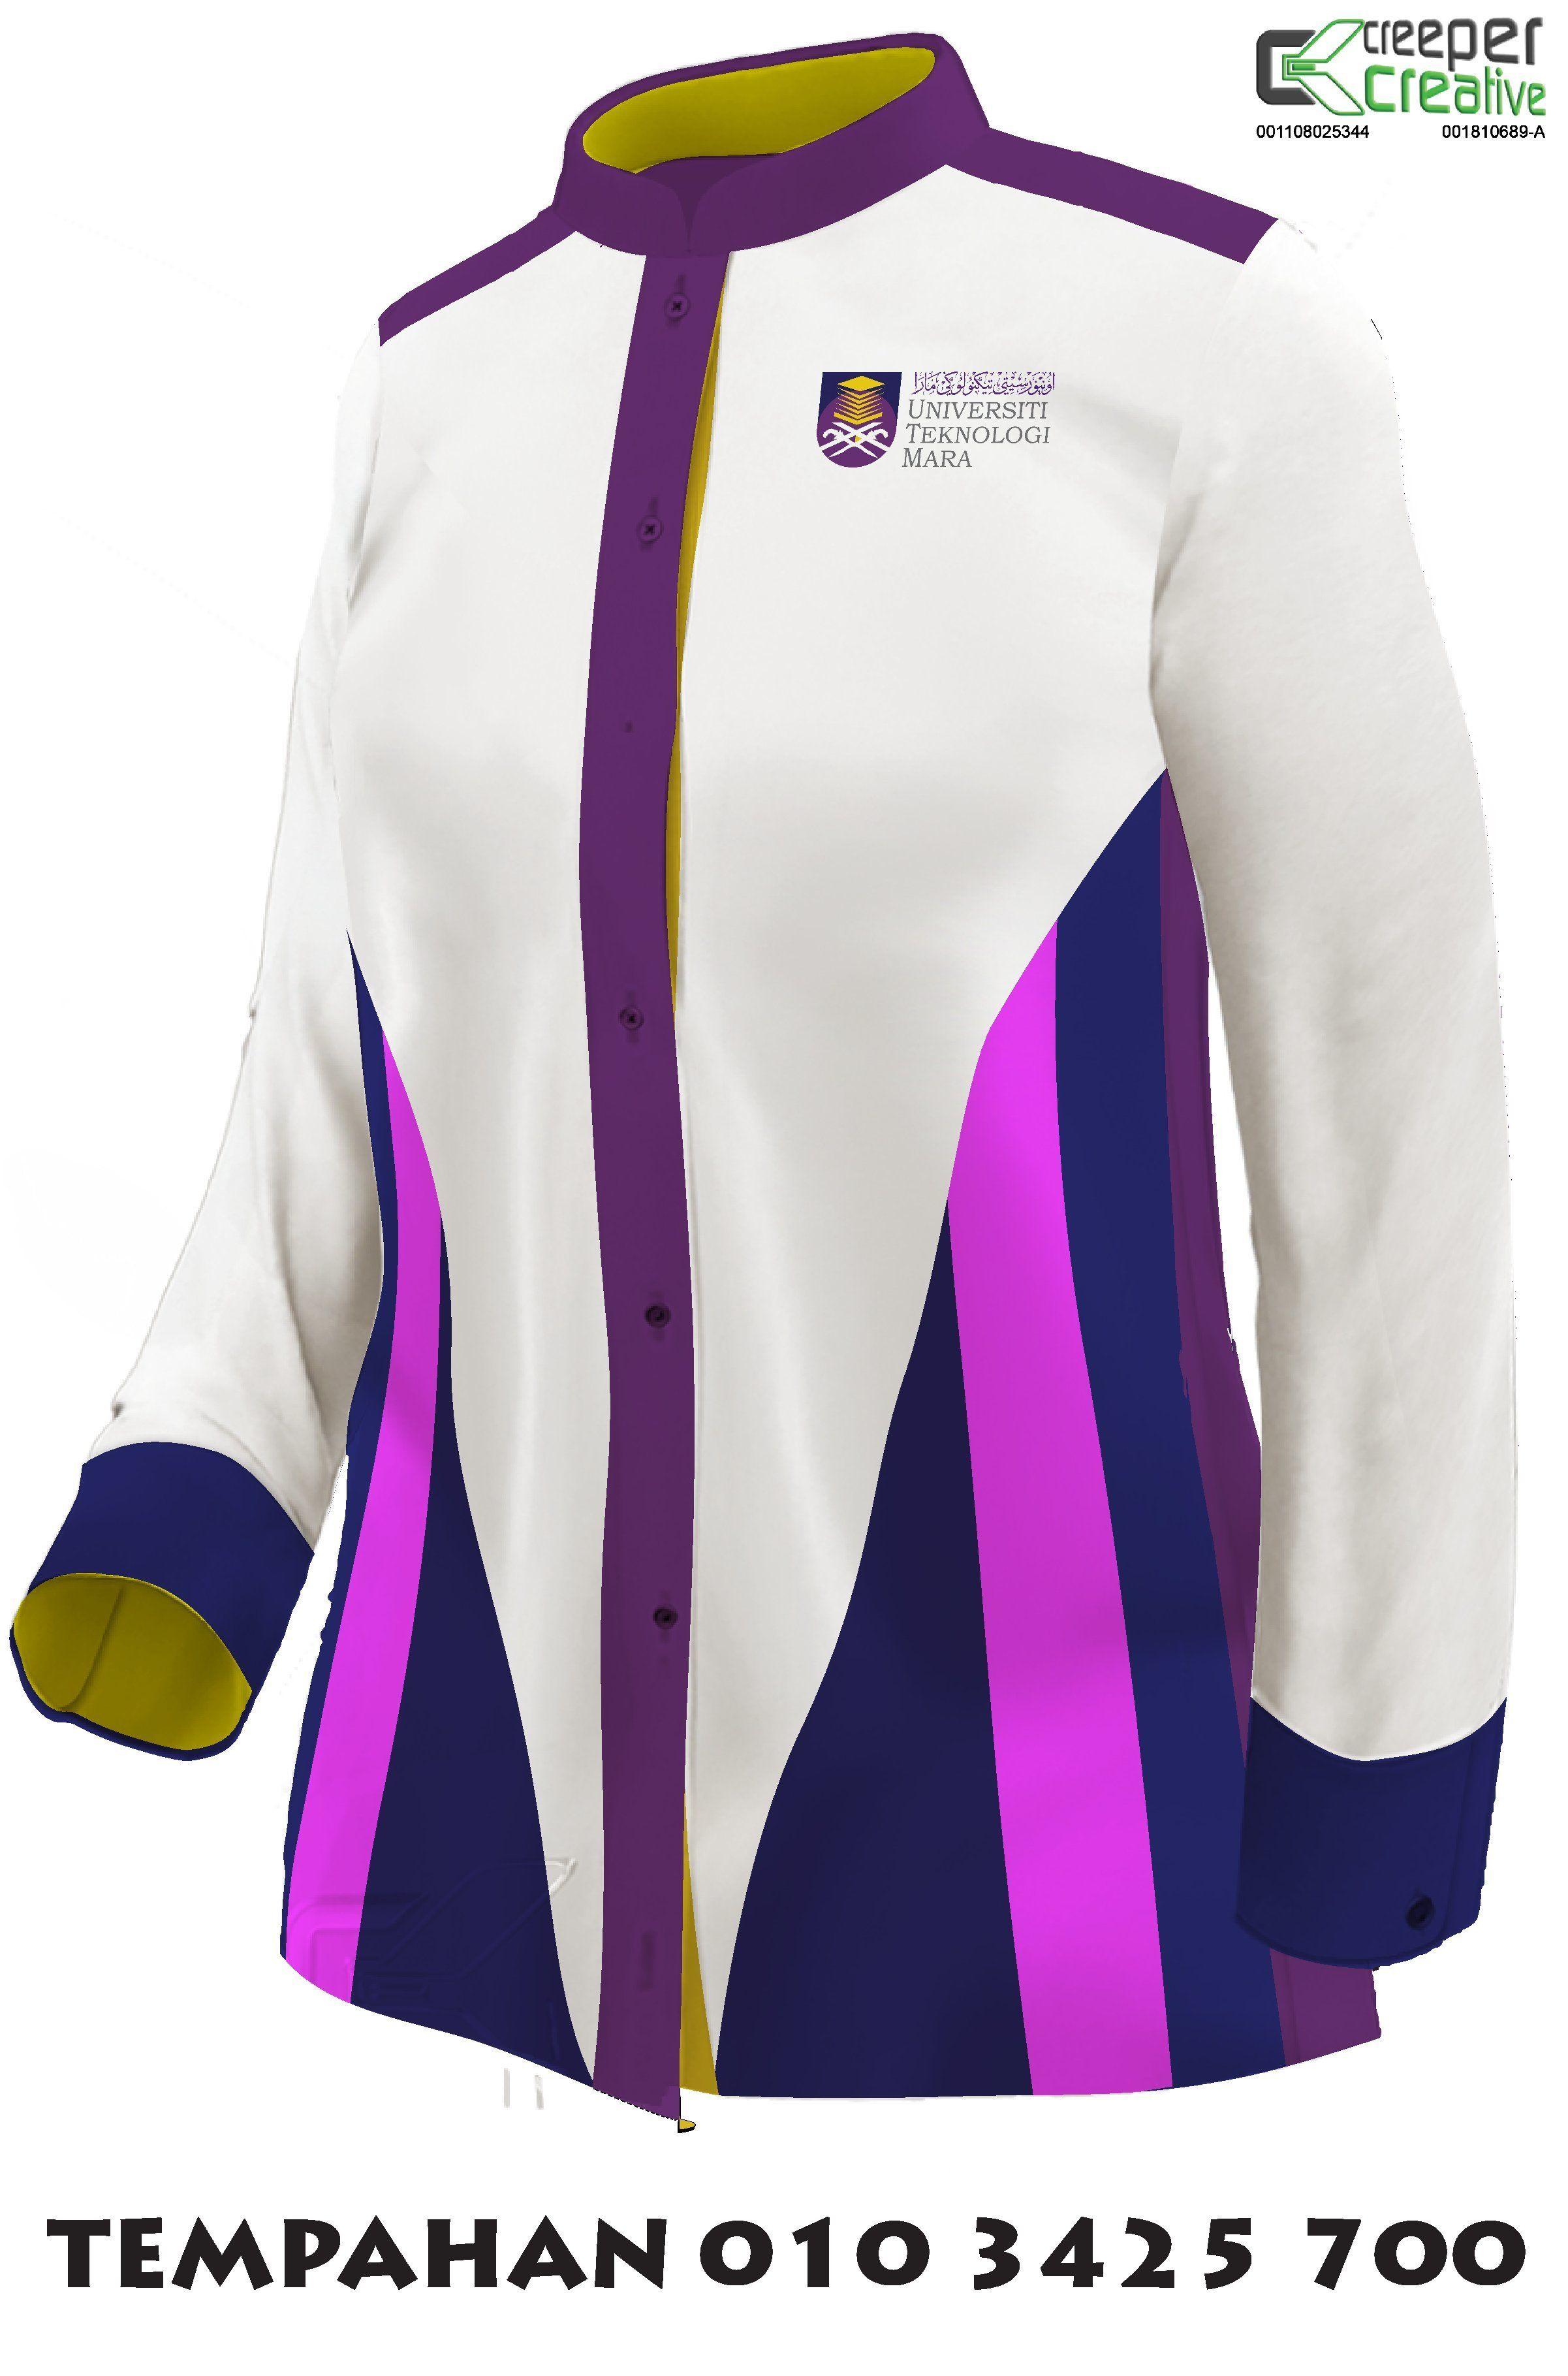 Tak Berkategori F1 Shirt Catalog post design baju korporat contoh design baju korporat baju korporat Contect Us 6 700